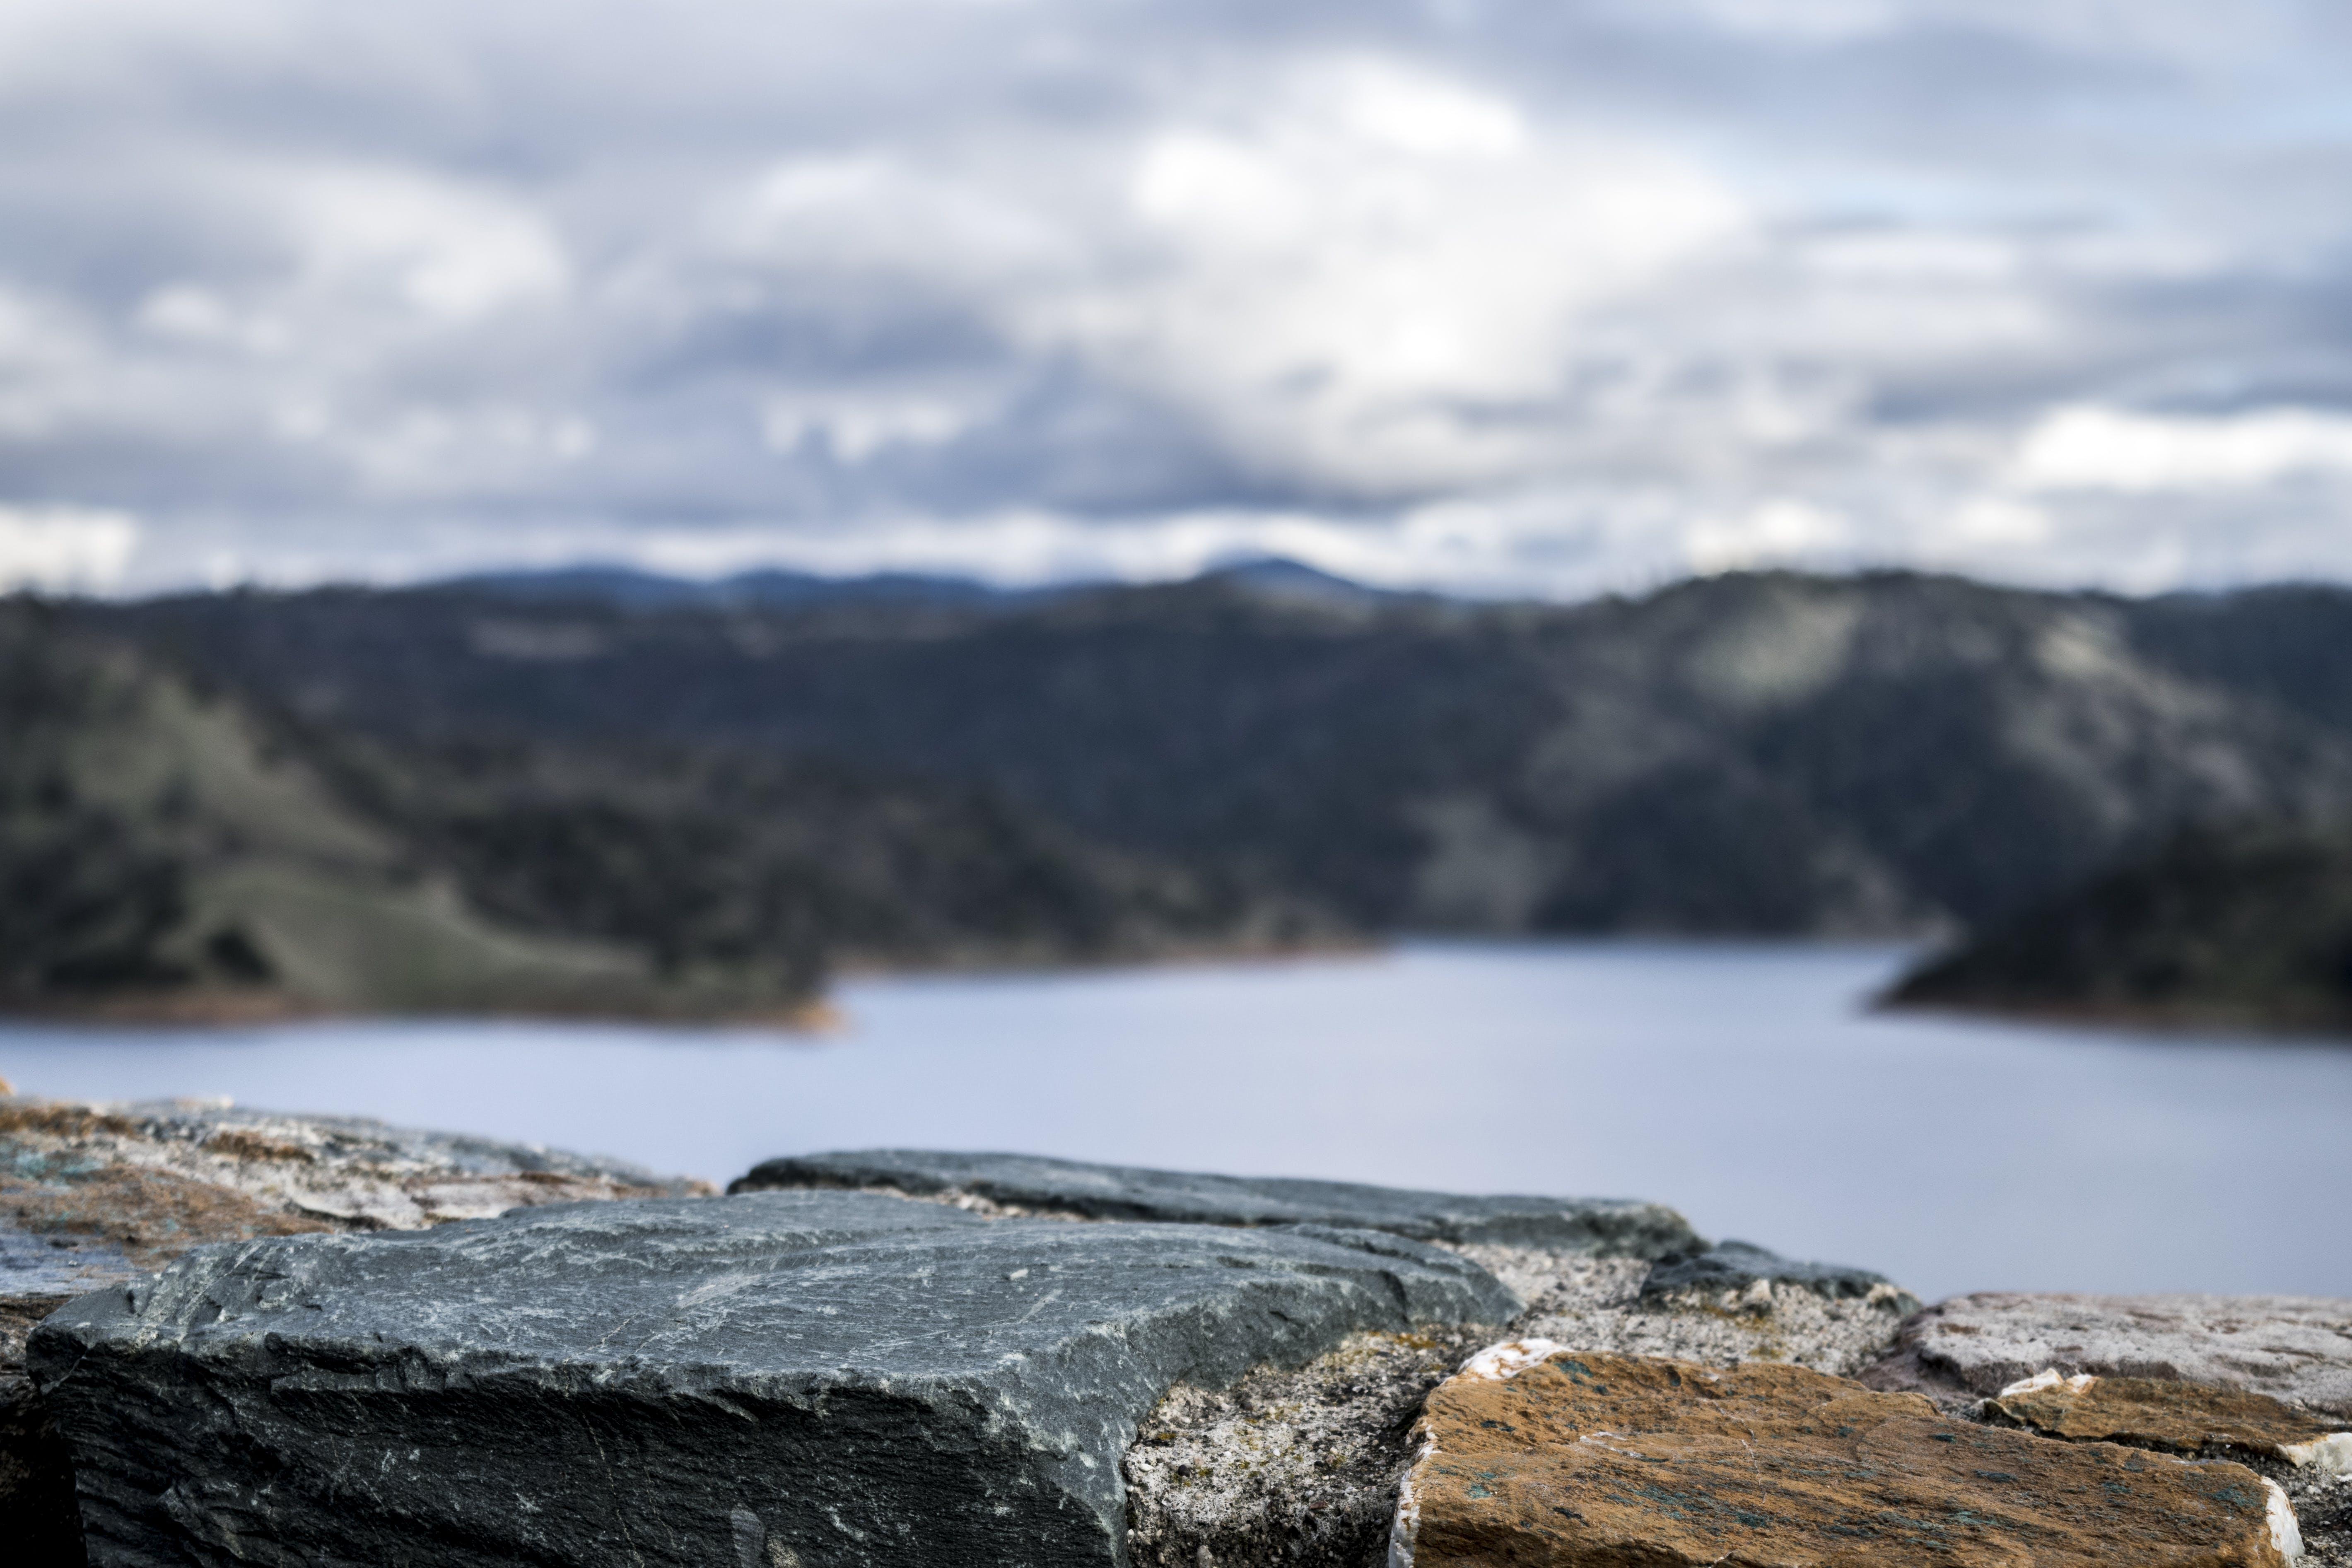 Photography of Lake Between Mountain at Daytime